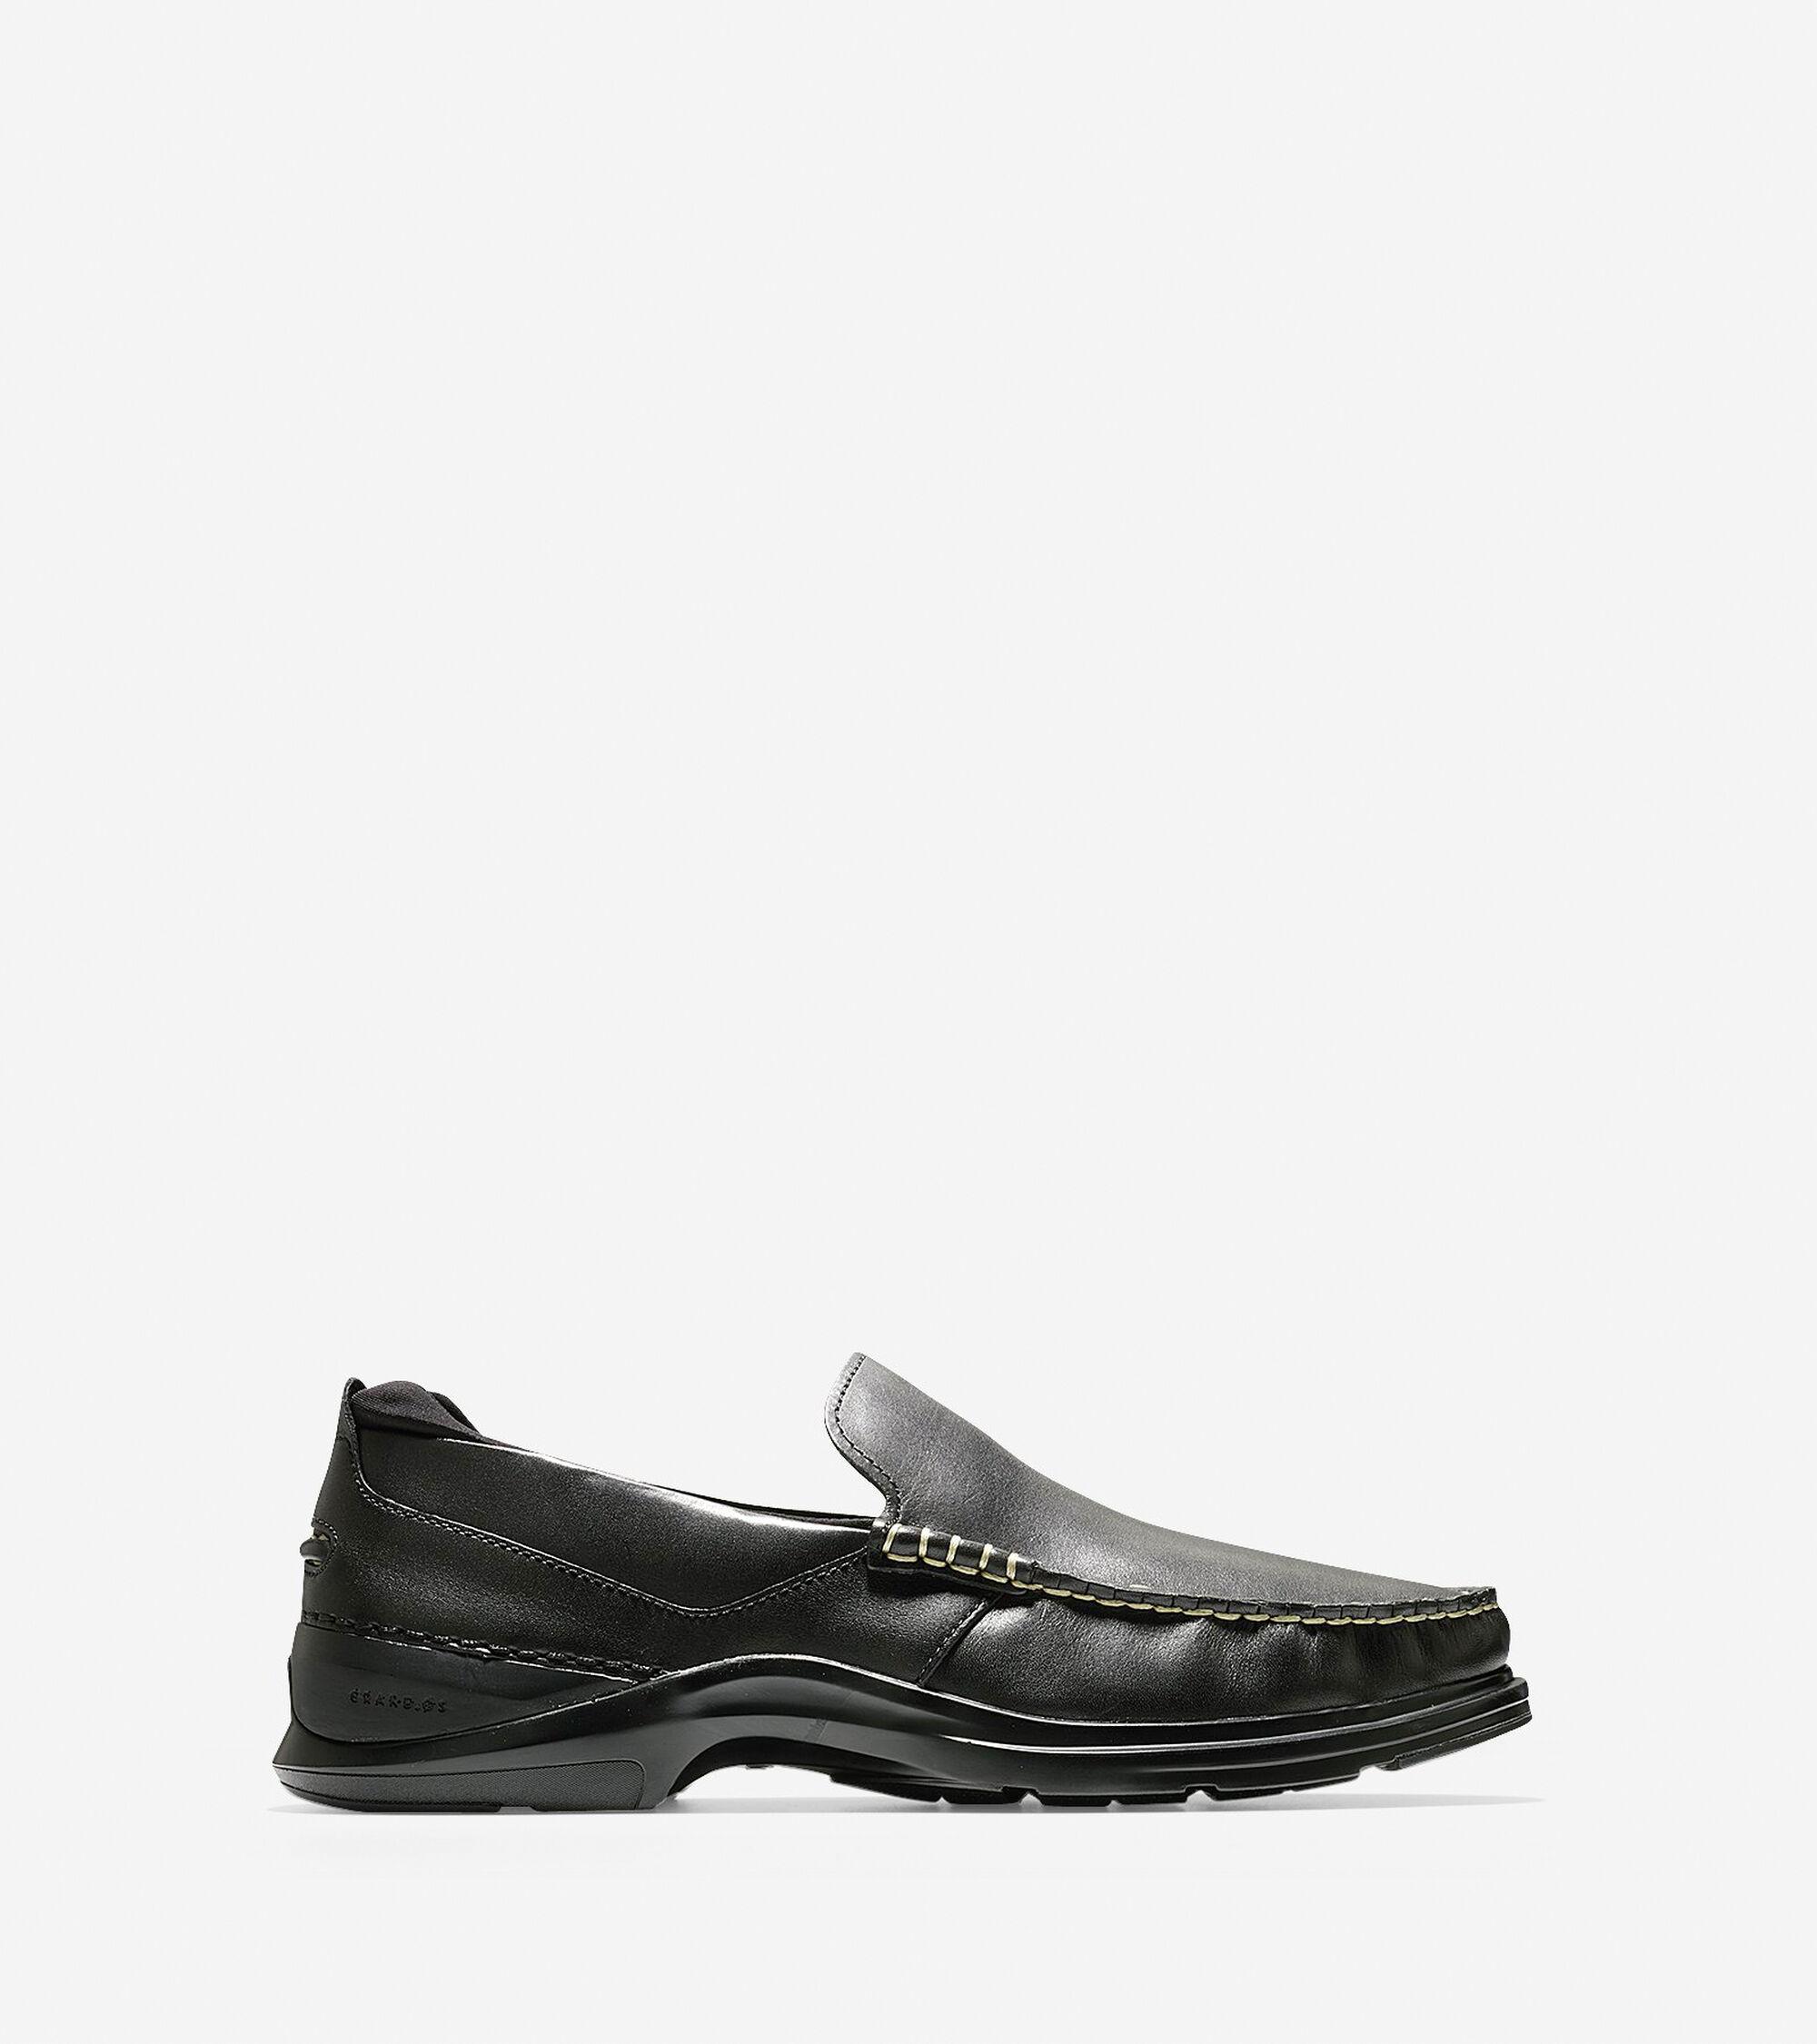 Cole Haan Bancroft Venetian Loafer